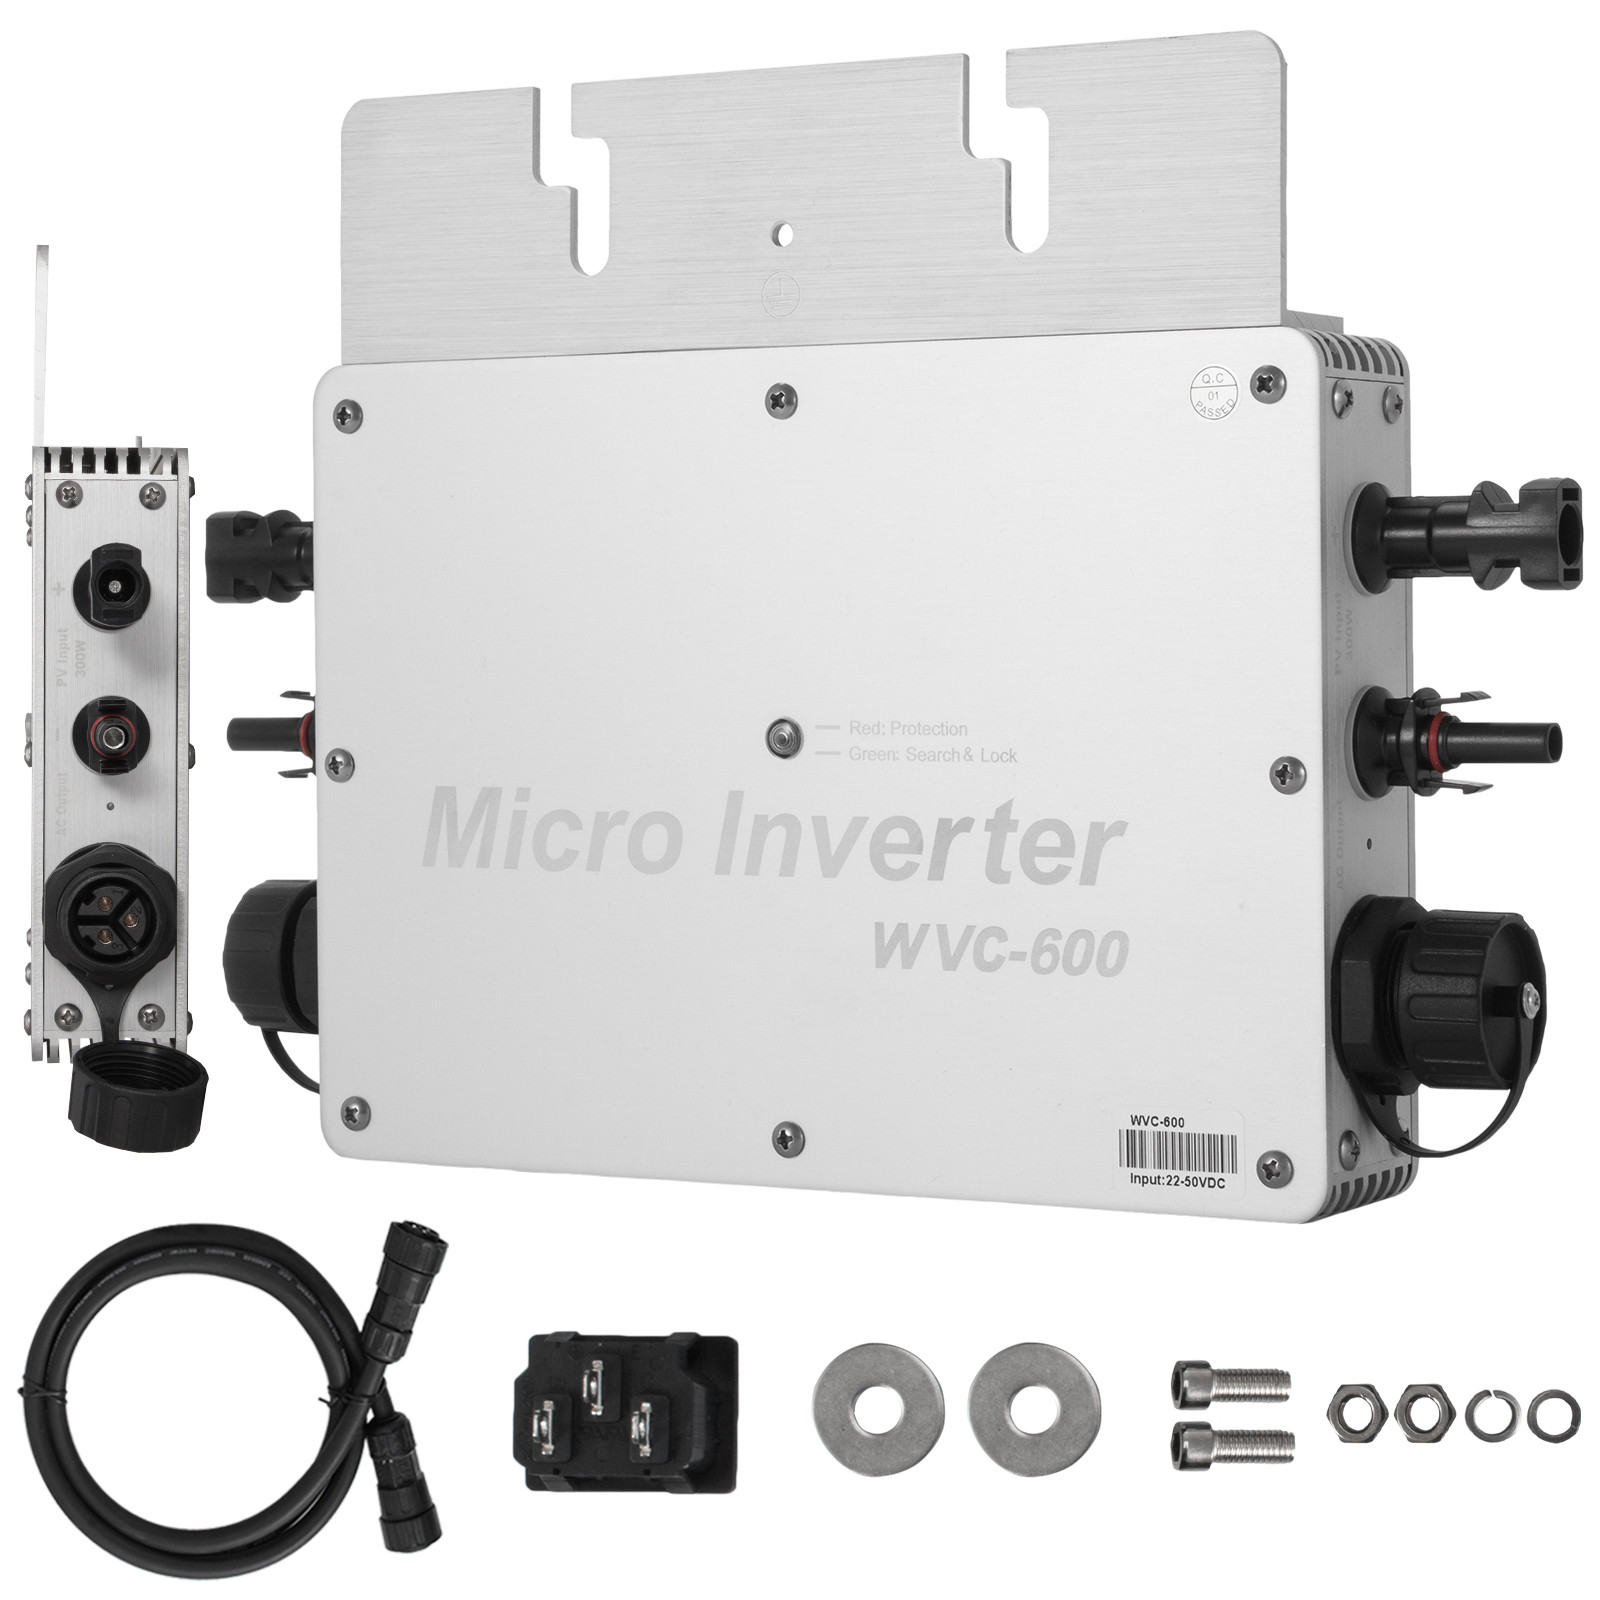 WVC-300W-600W-1200W-110V-220V-MPPT-Solar-Grid-Tie-Micro-Inverter-Waterproof-IP65 thumbnail 48